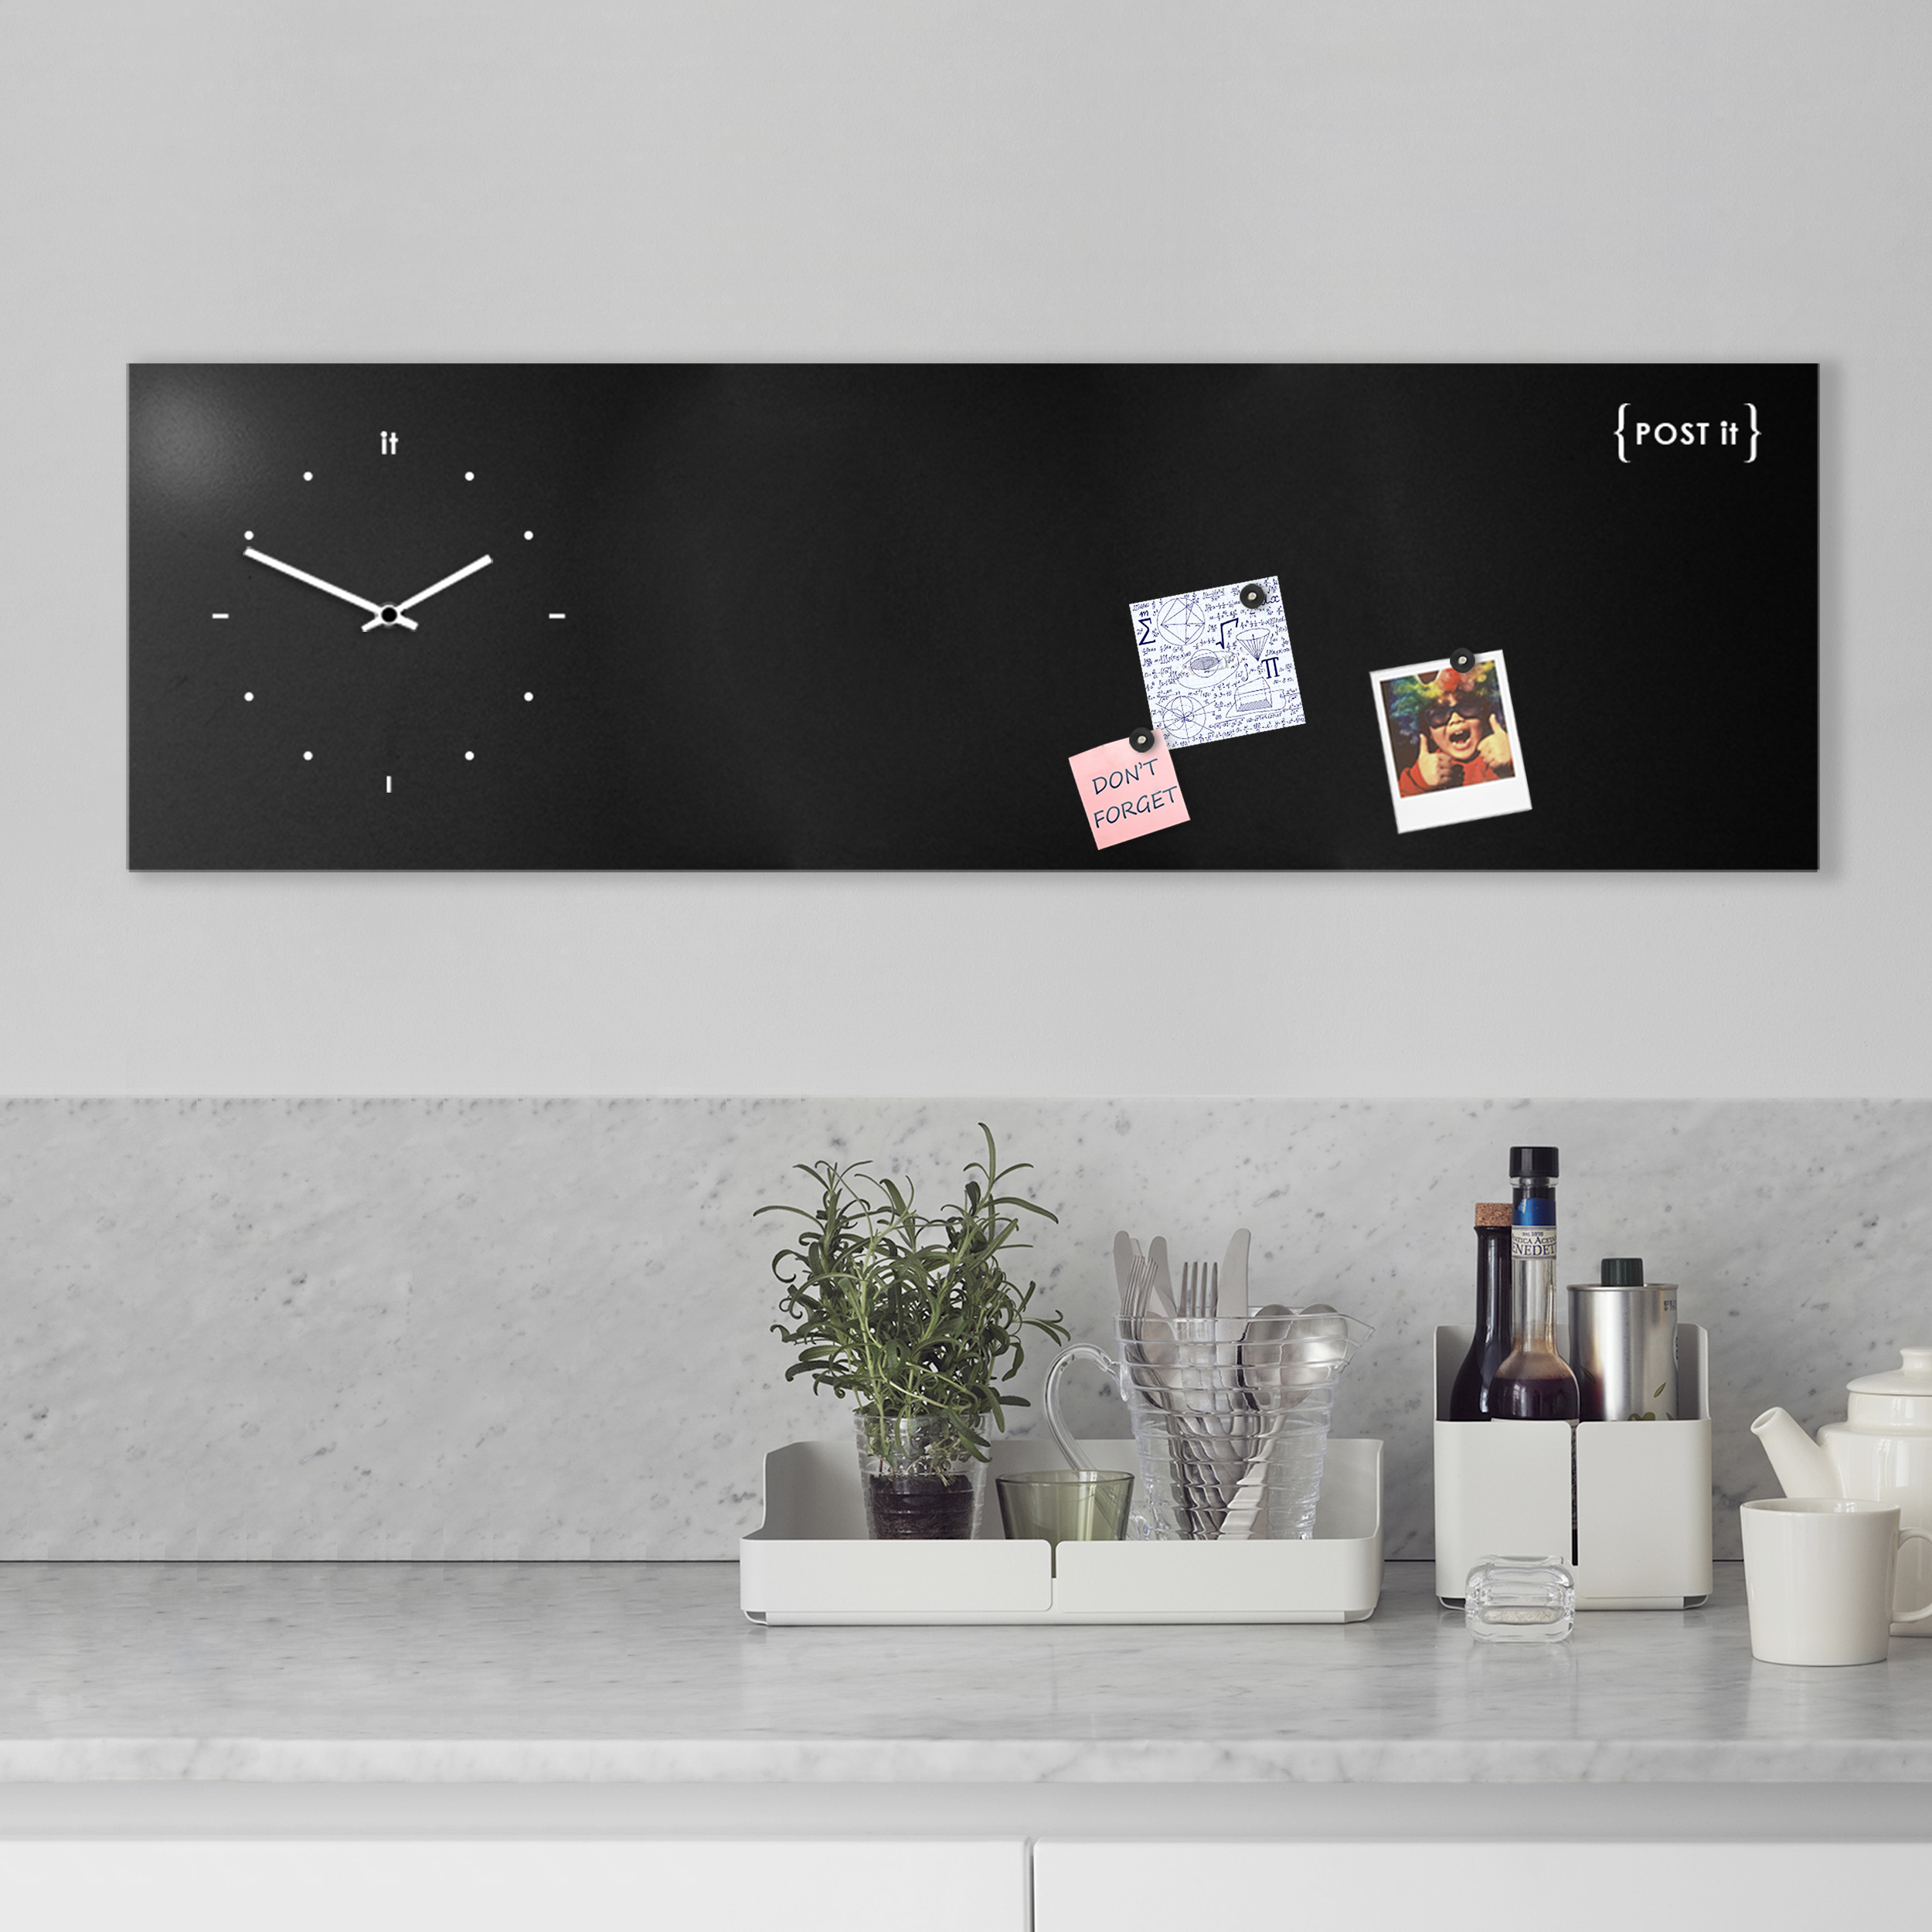 design-clock-magnetic-board-orologio-lavagna-magnetica-post it-black-mood